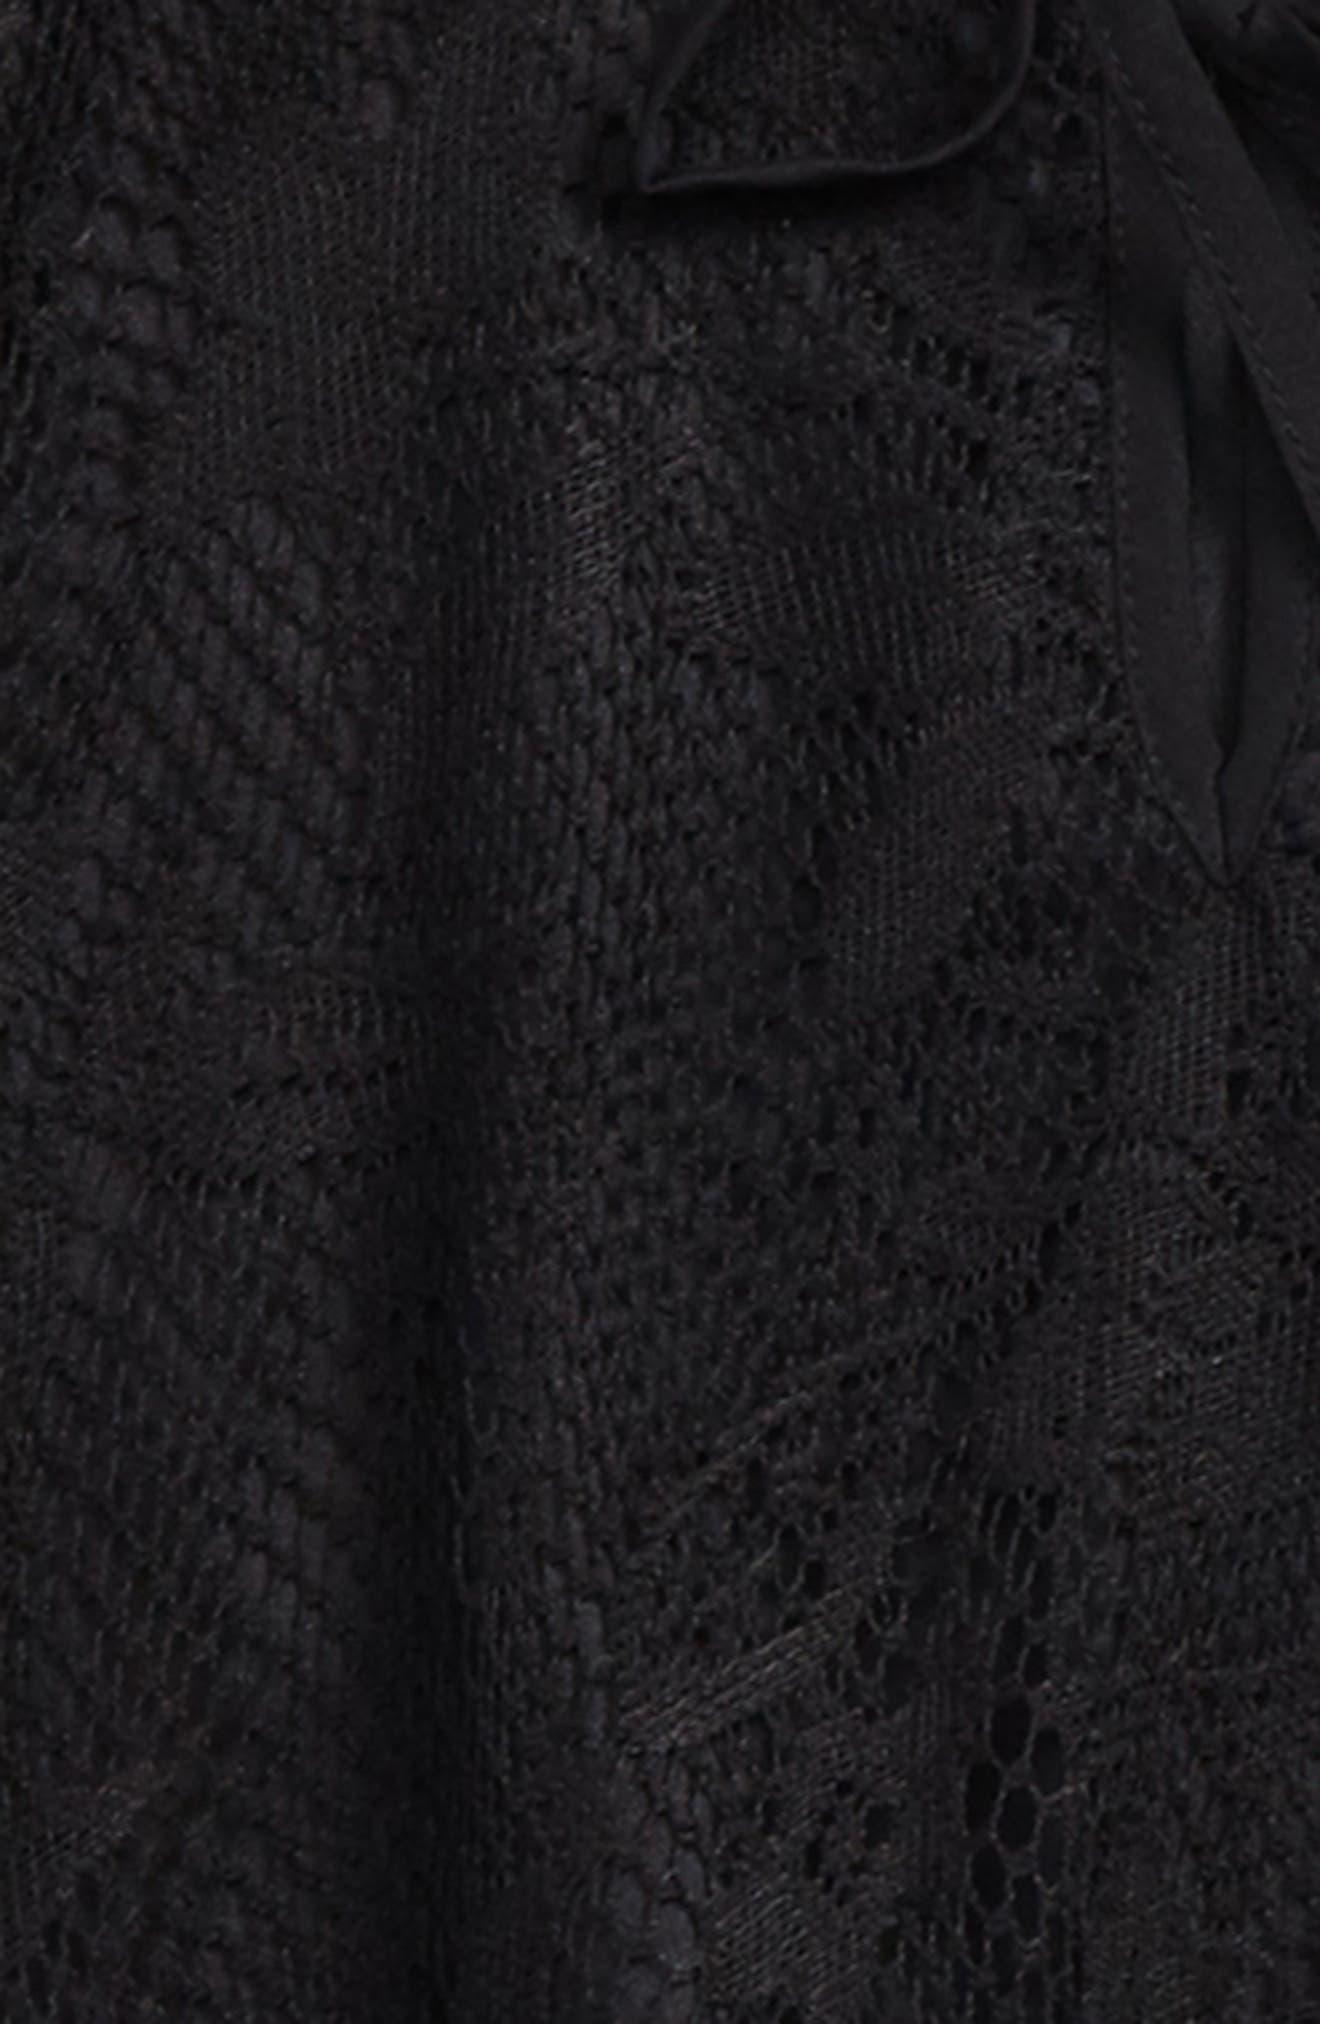 Zoe & Rose Lace Flare Sleeve Blouse,                             Alternate thumbnail 2, color,                             Black